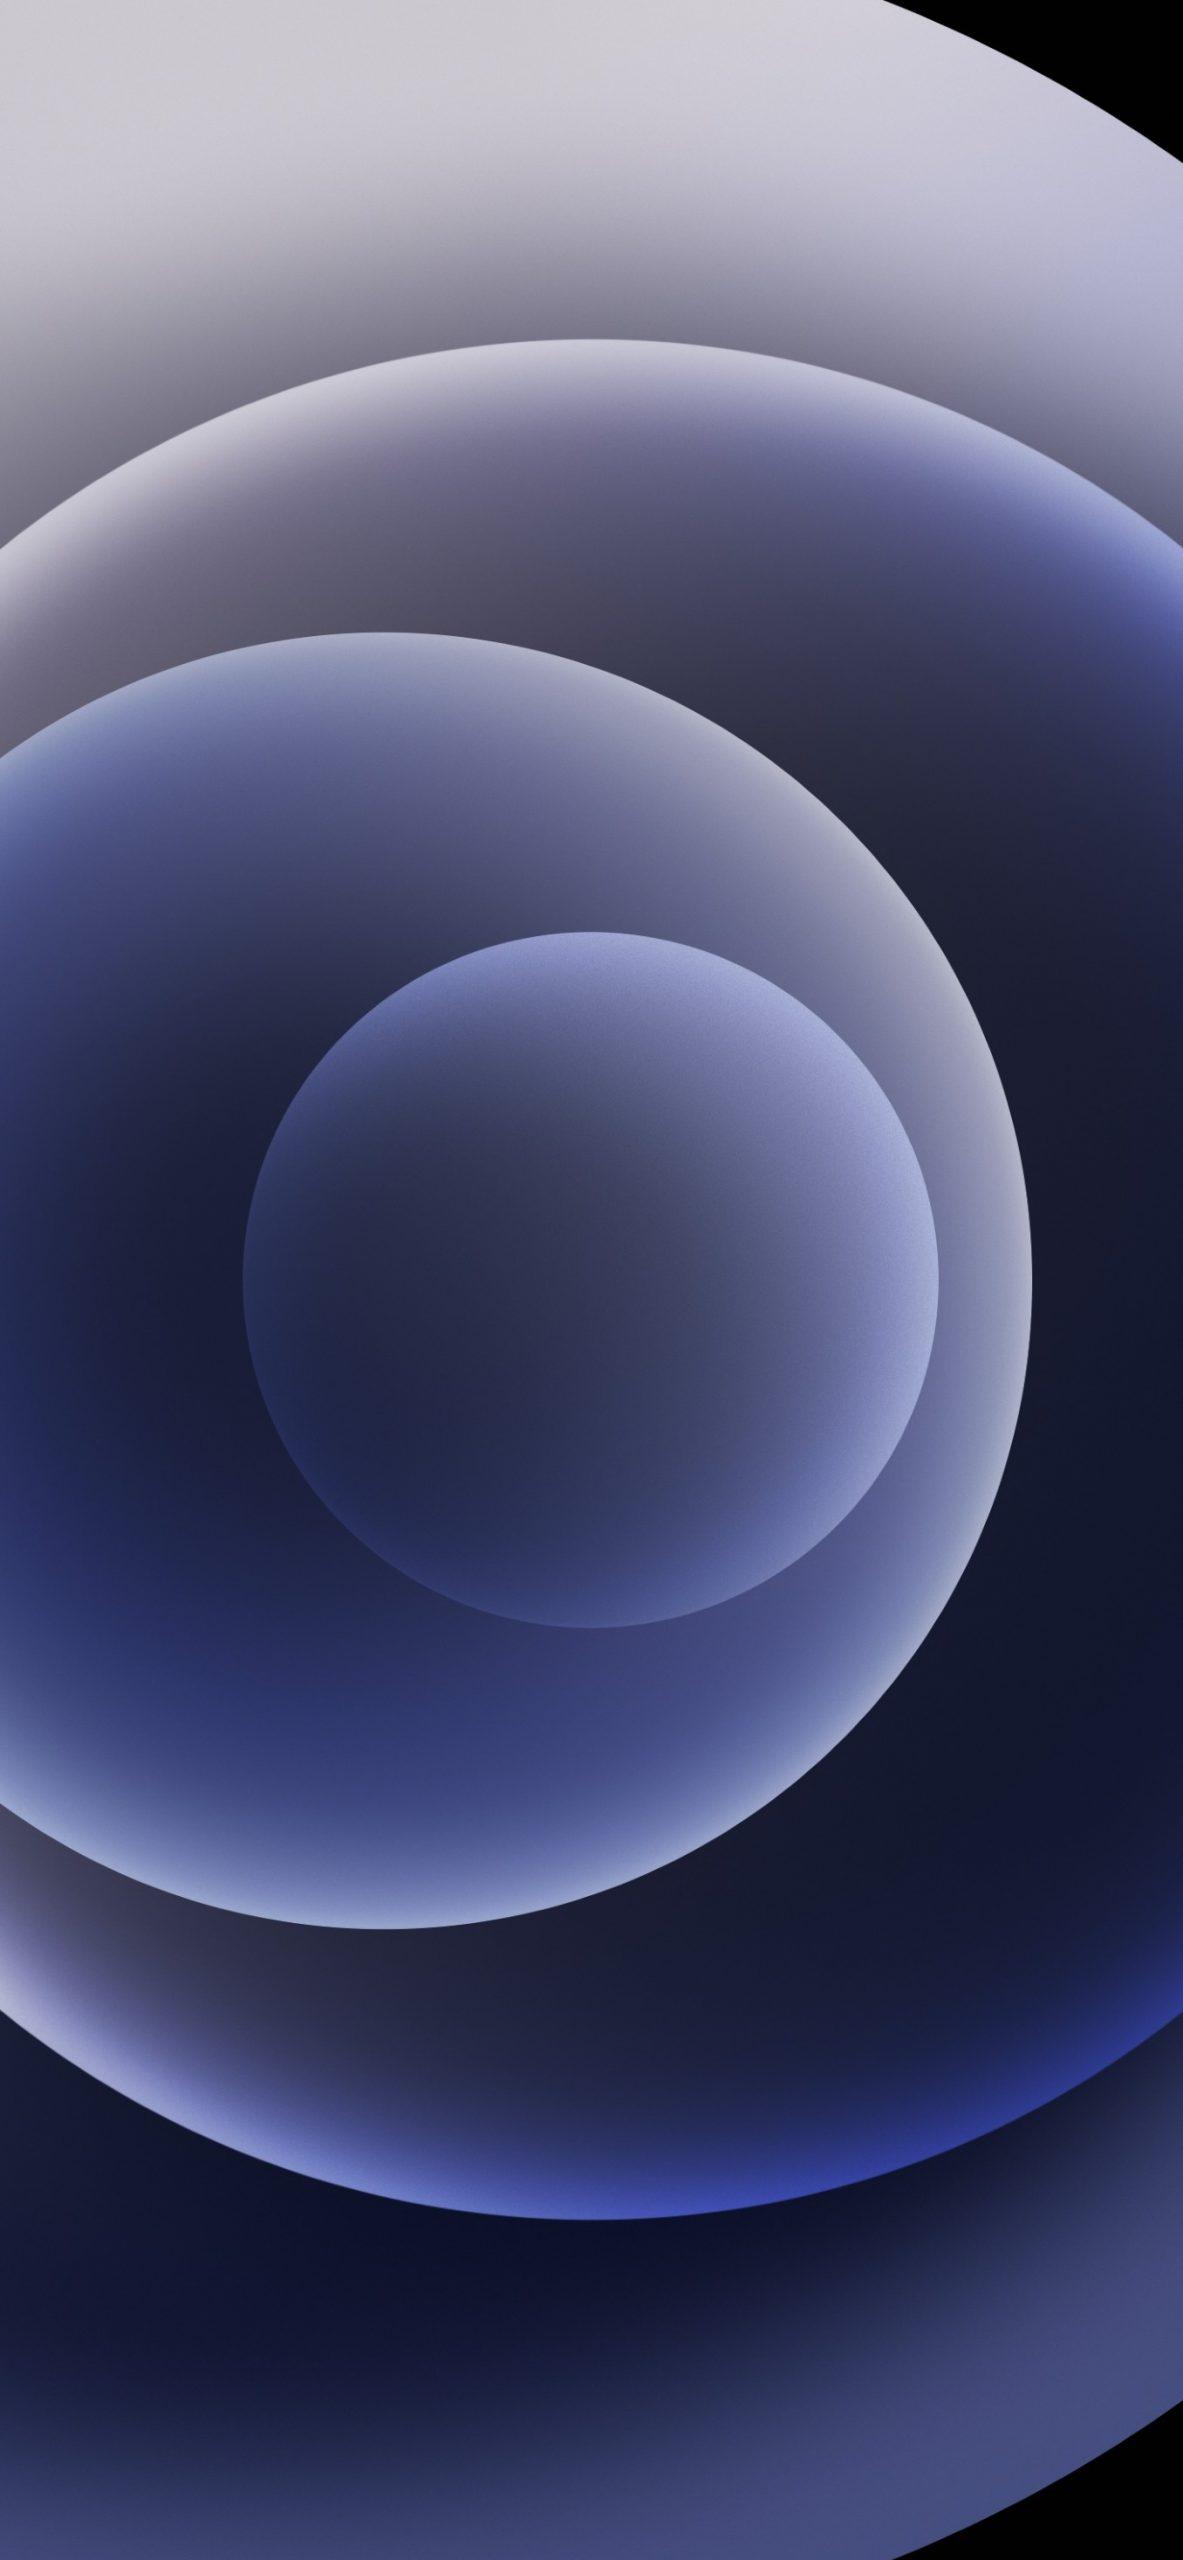 iphone 12 orb black light scaled